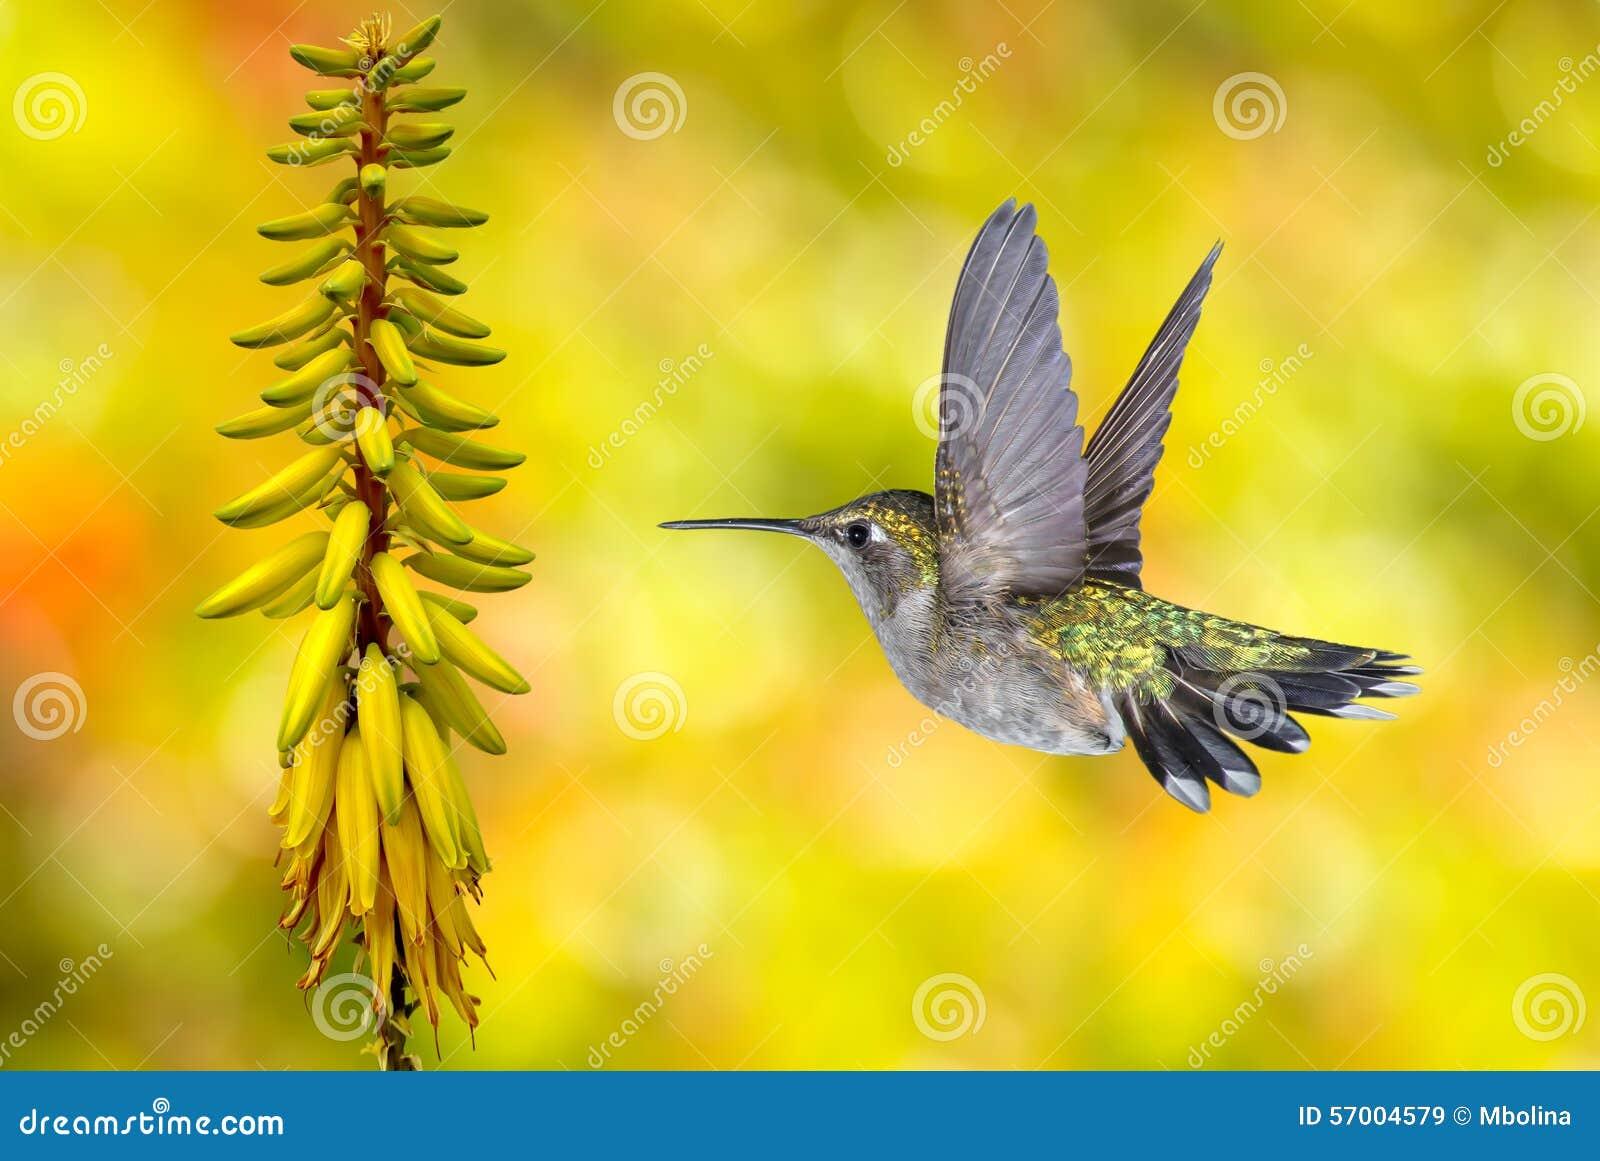 Hummingbird Flying over Yellow Background